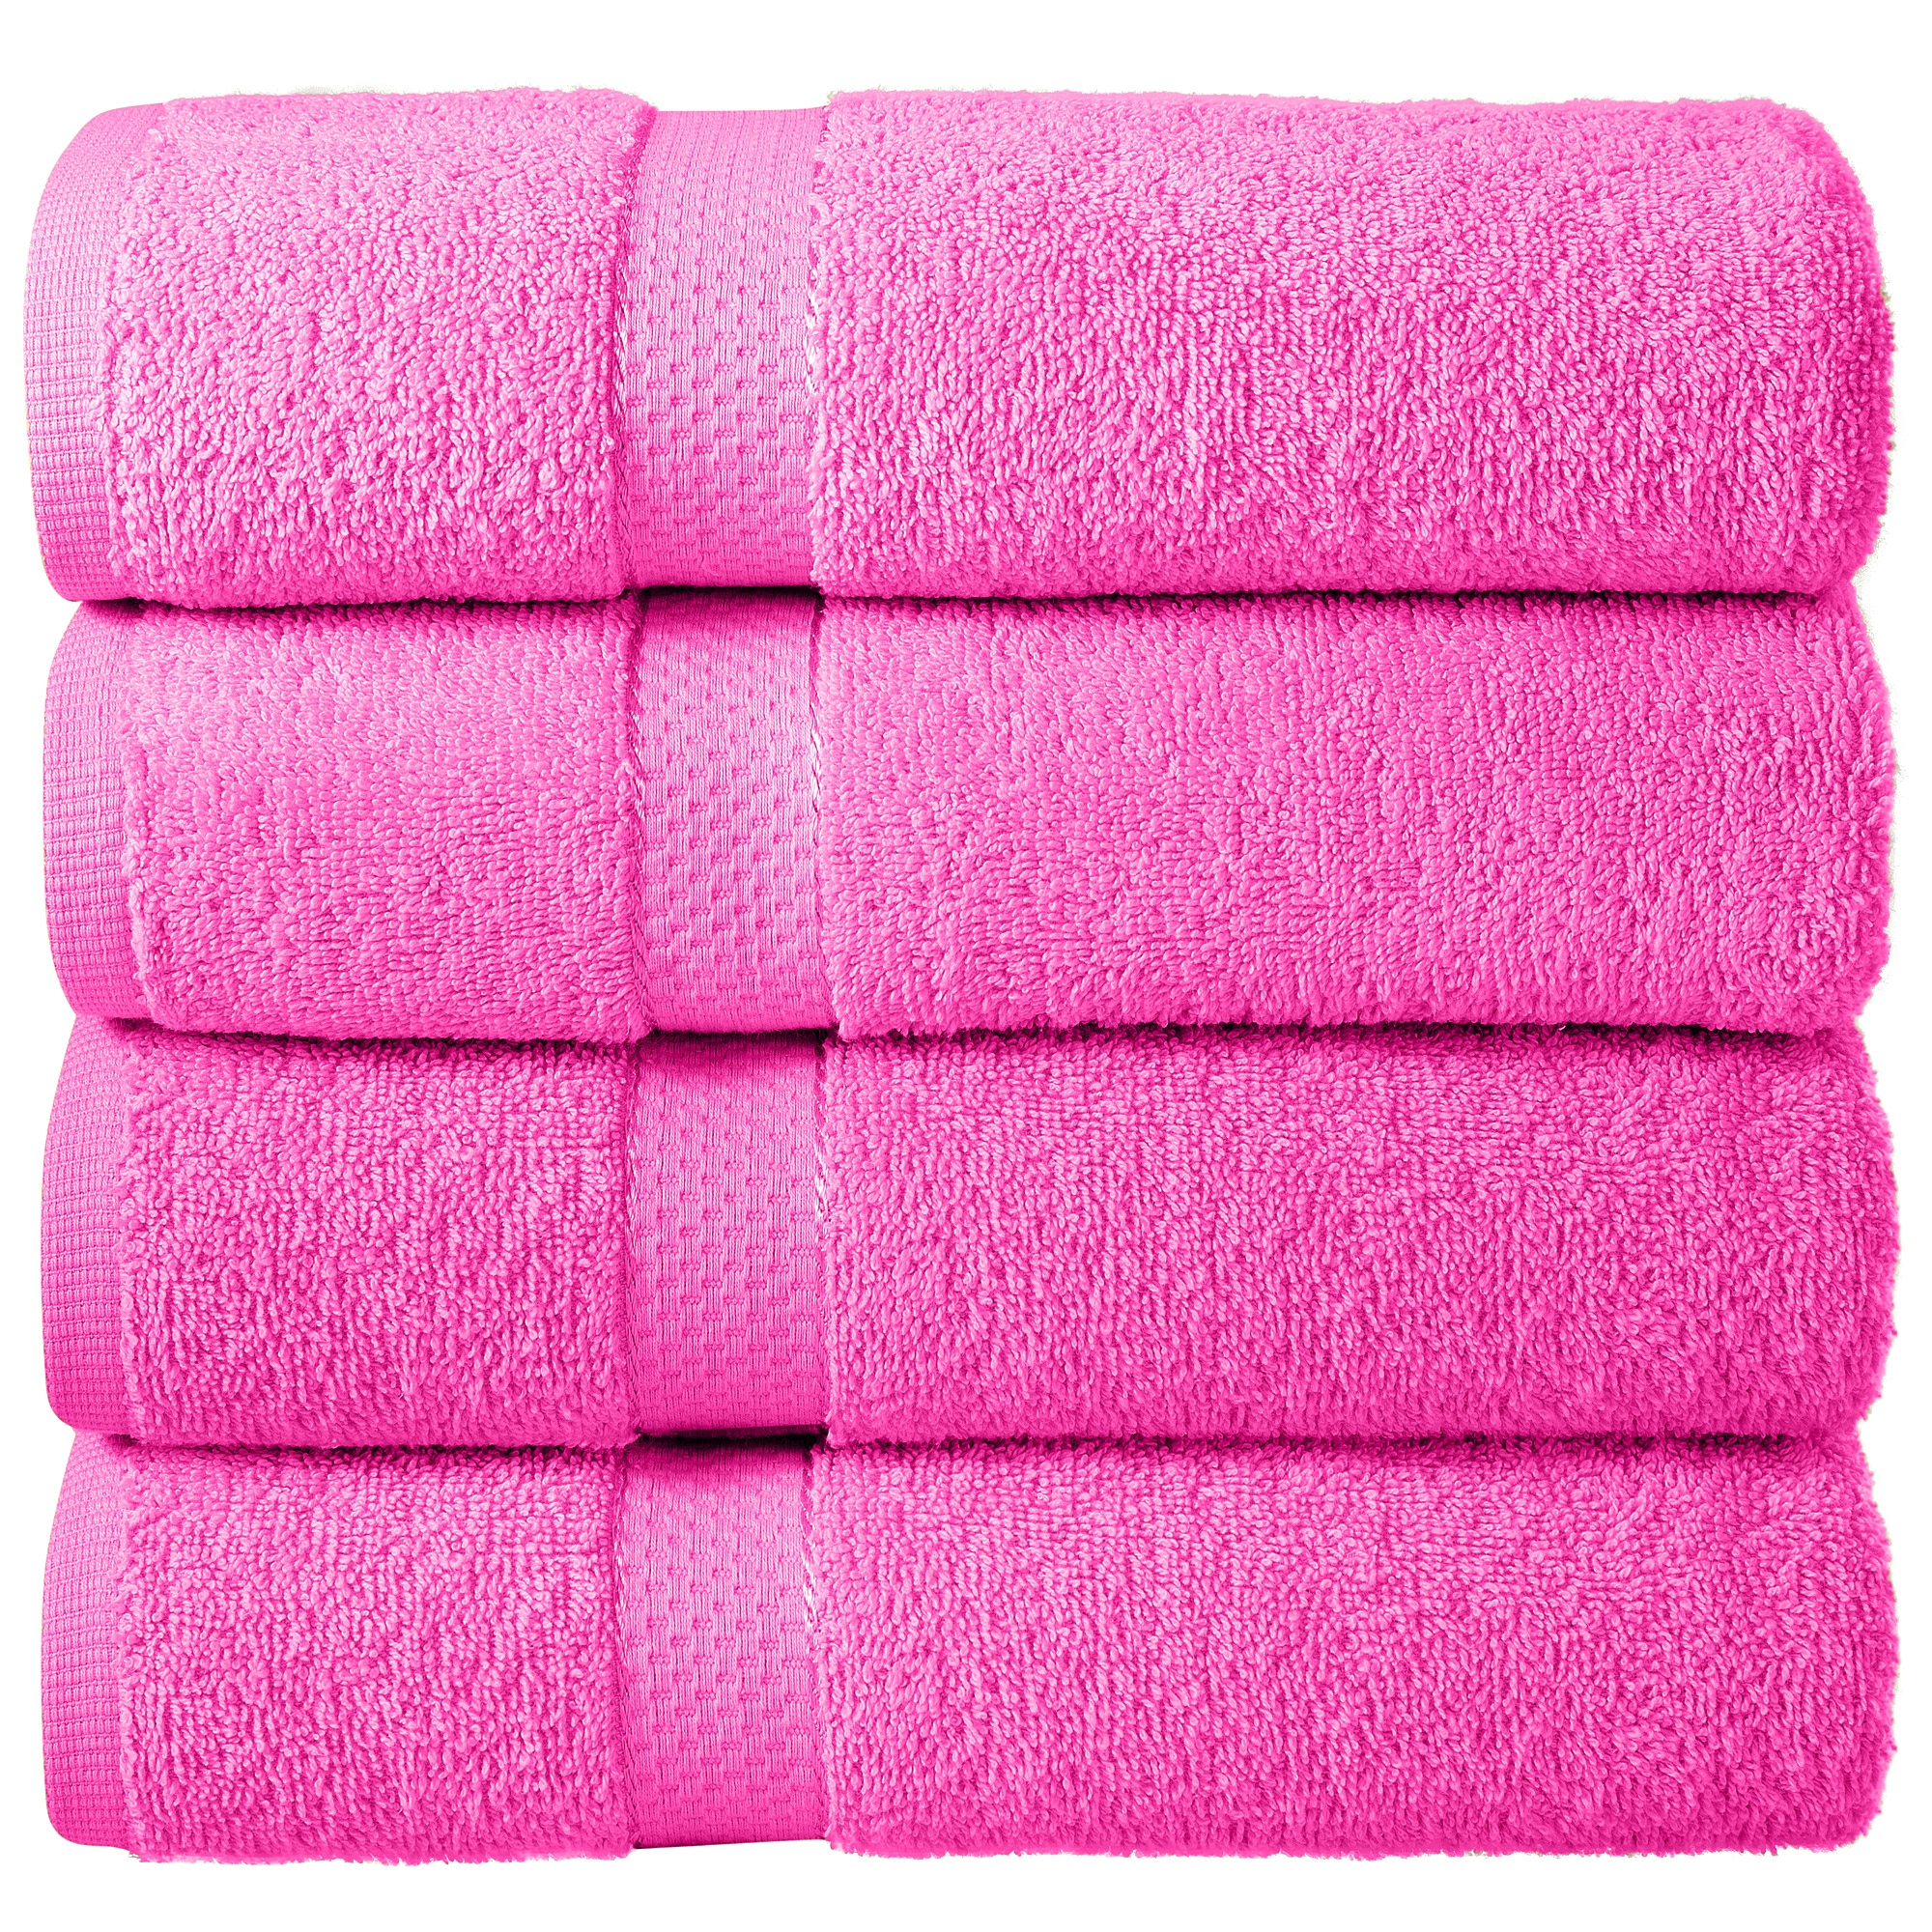 Bale Set 4pcs Pink Viscose Plain Bath Sheet Towel